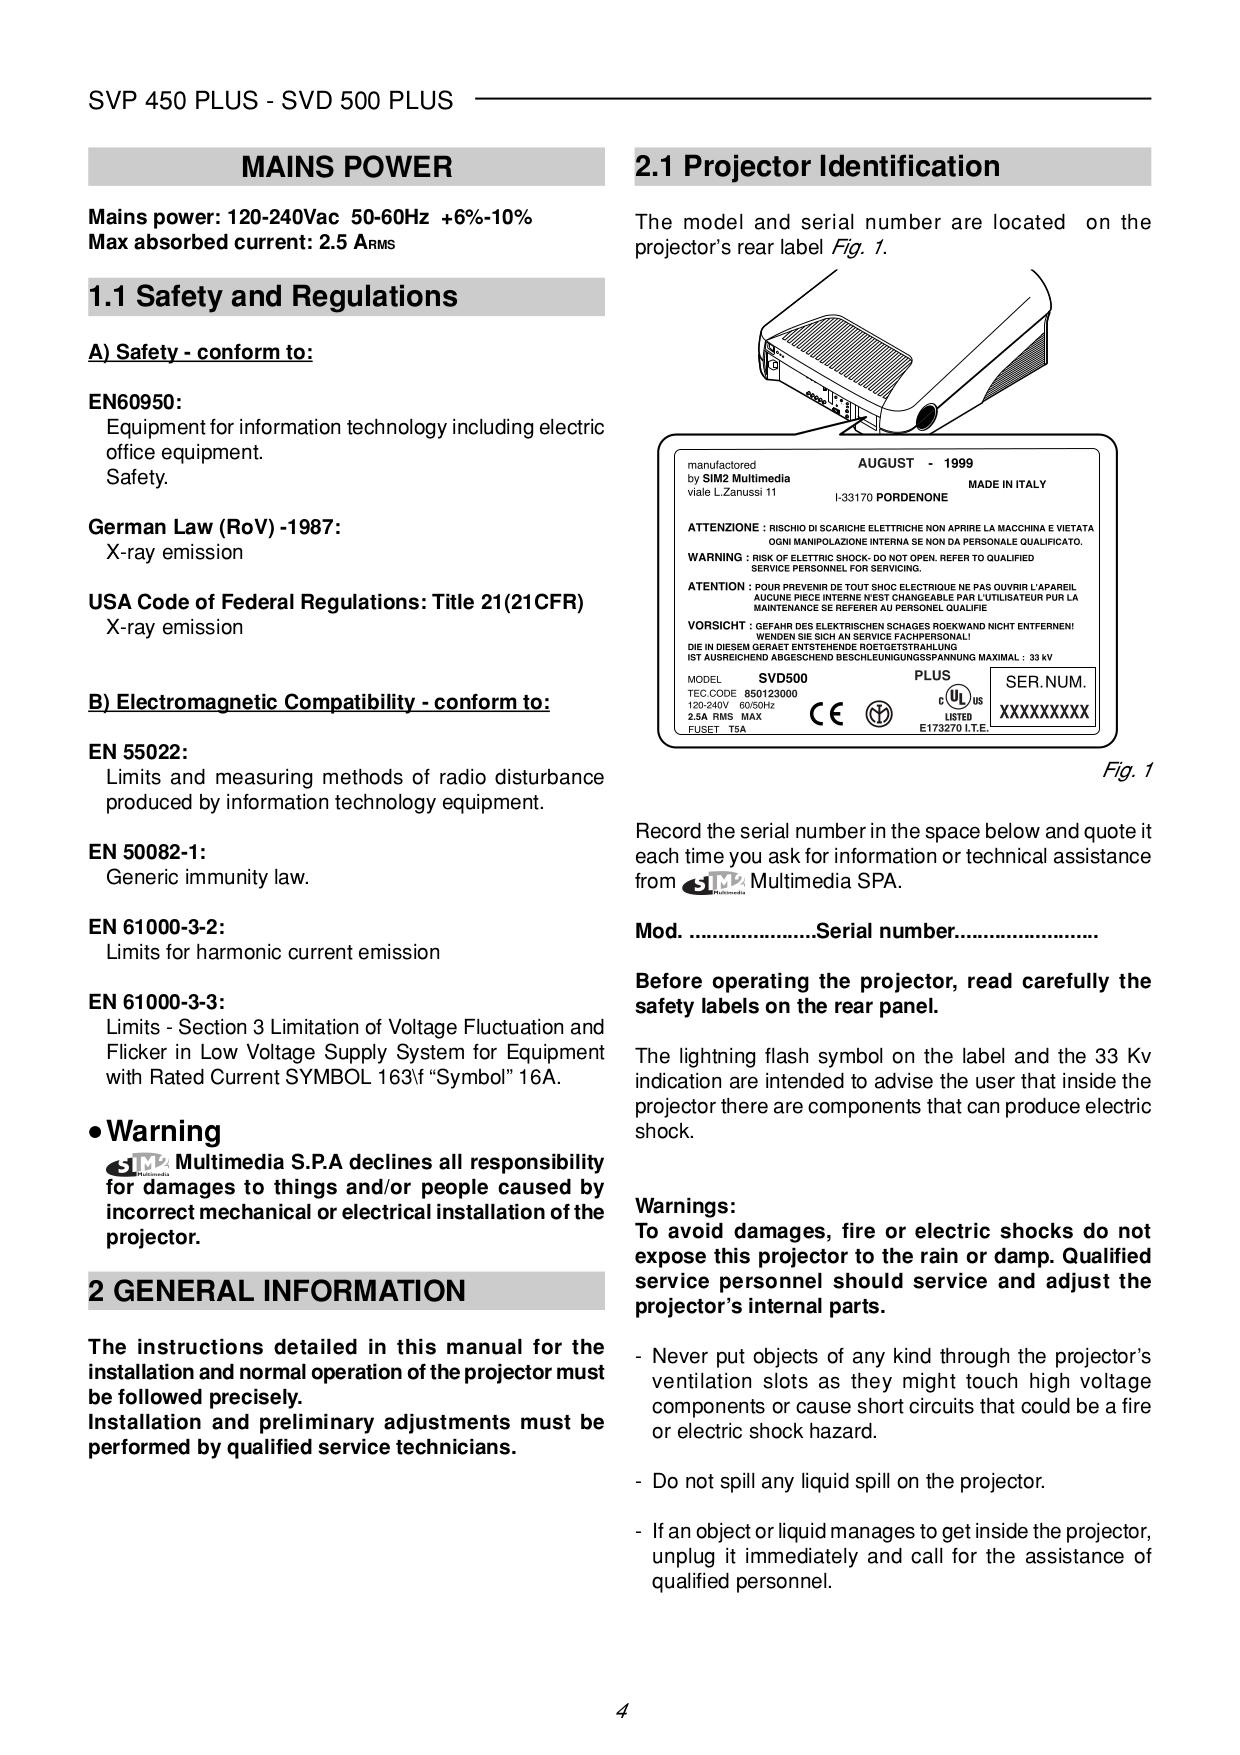 pdf manual for sim2 projector svp 450 plus rh umlib com SVP Scanner ACN SVP